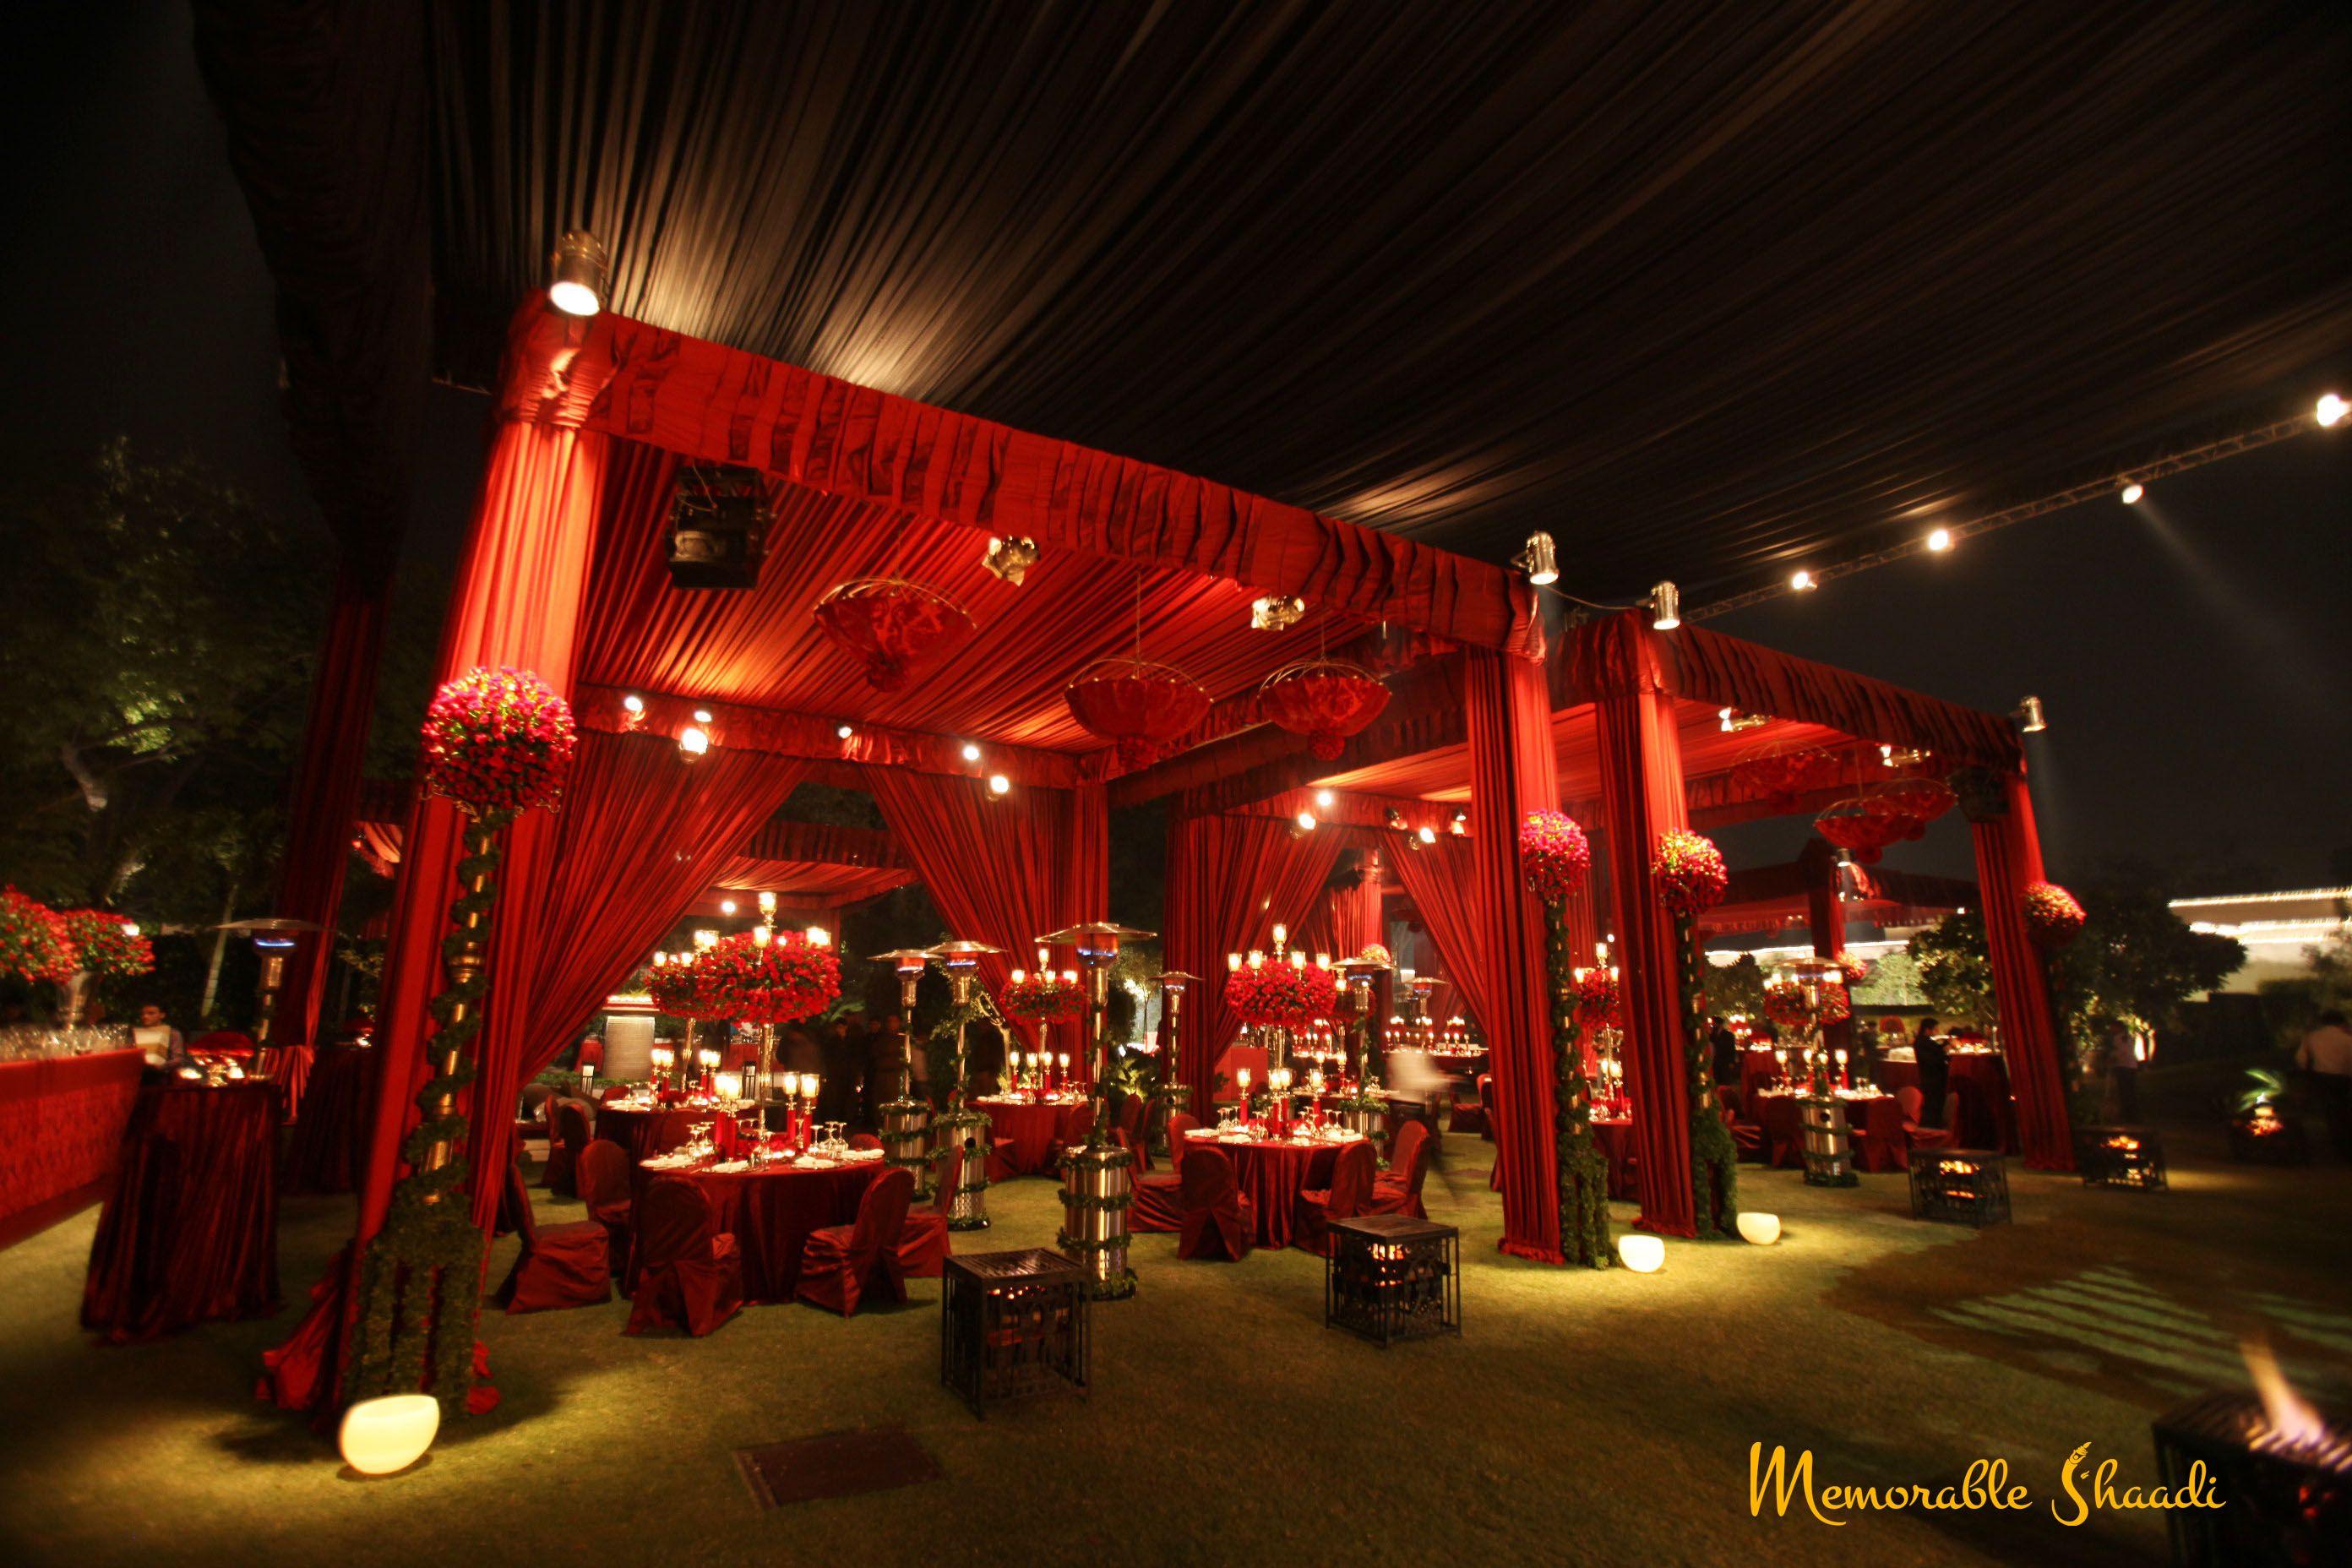 Royal red theme wedding decorations memorable shaadi wedding royal red theme wedding decorations junglespirit Gallery